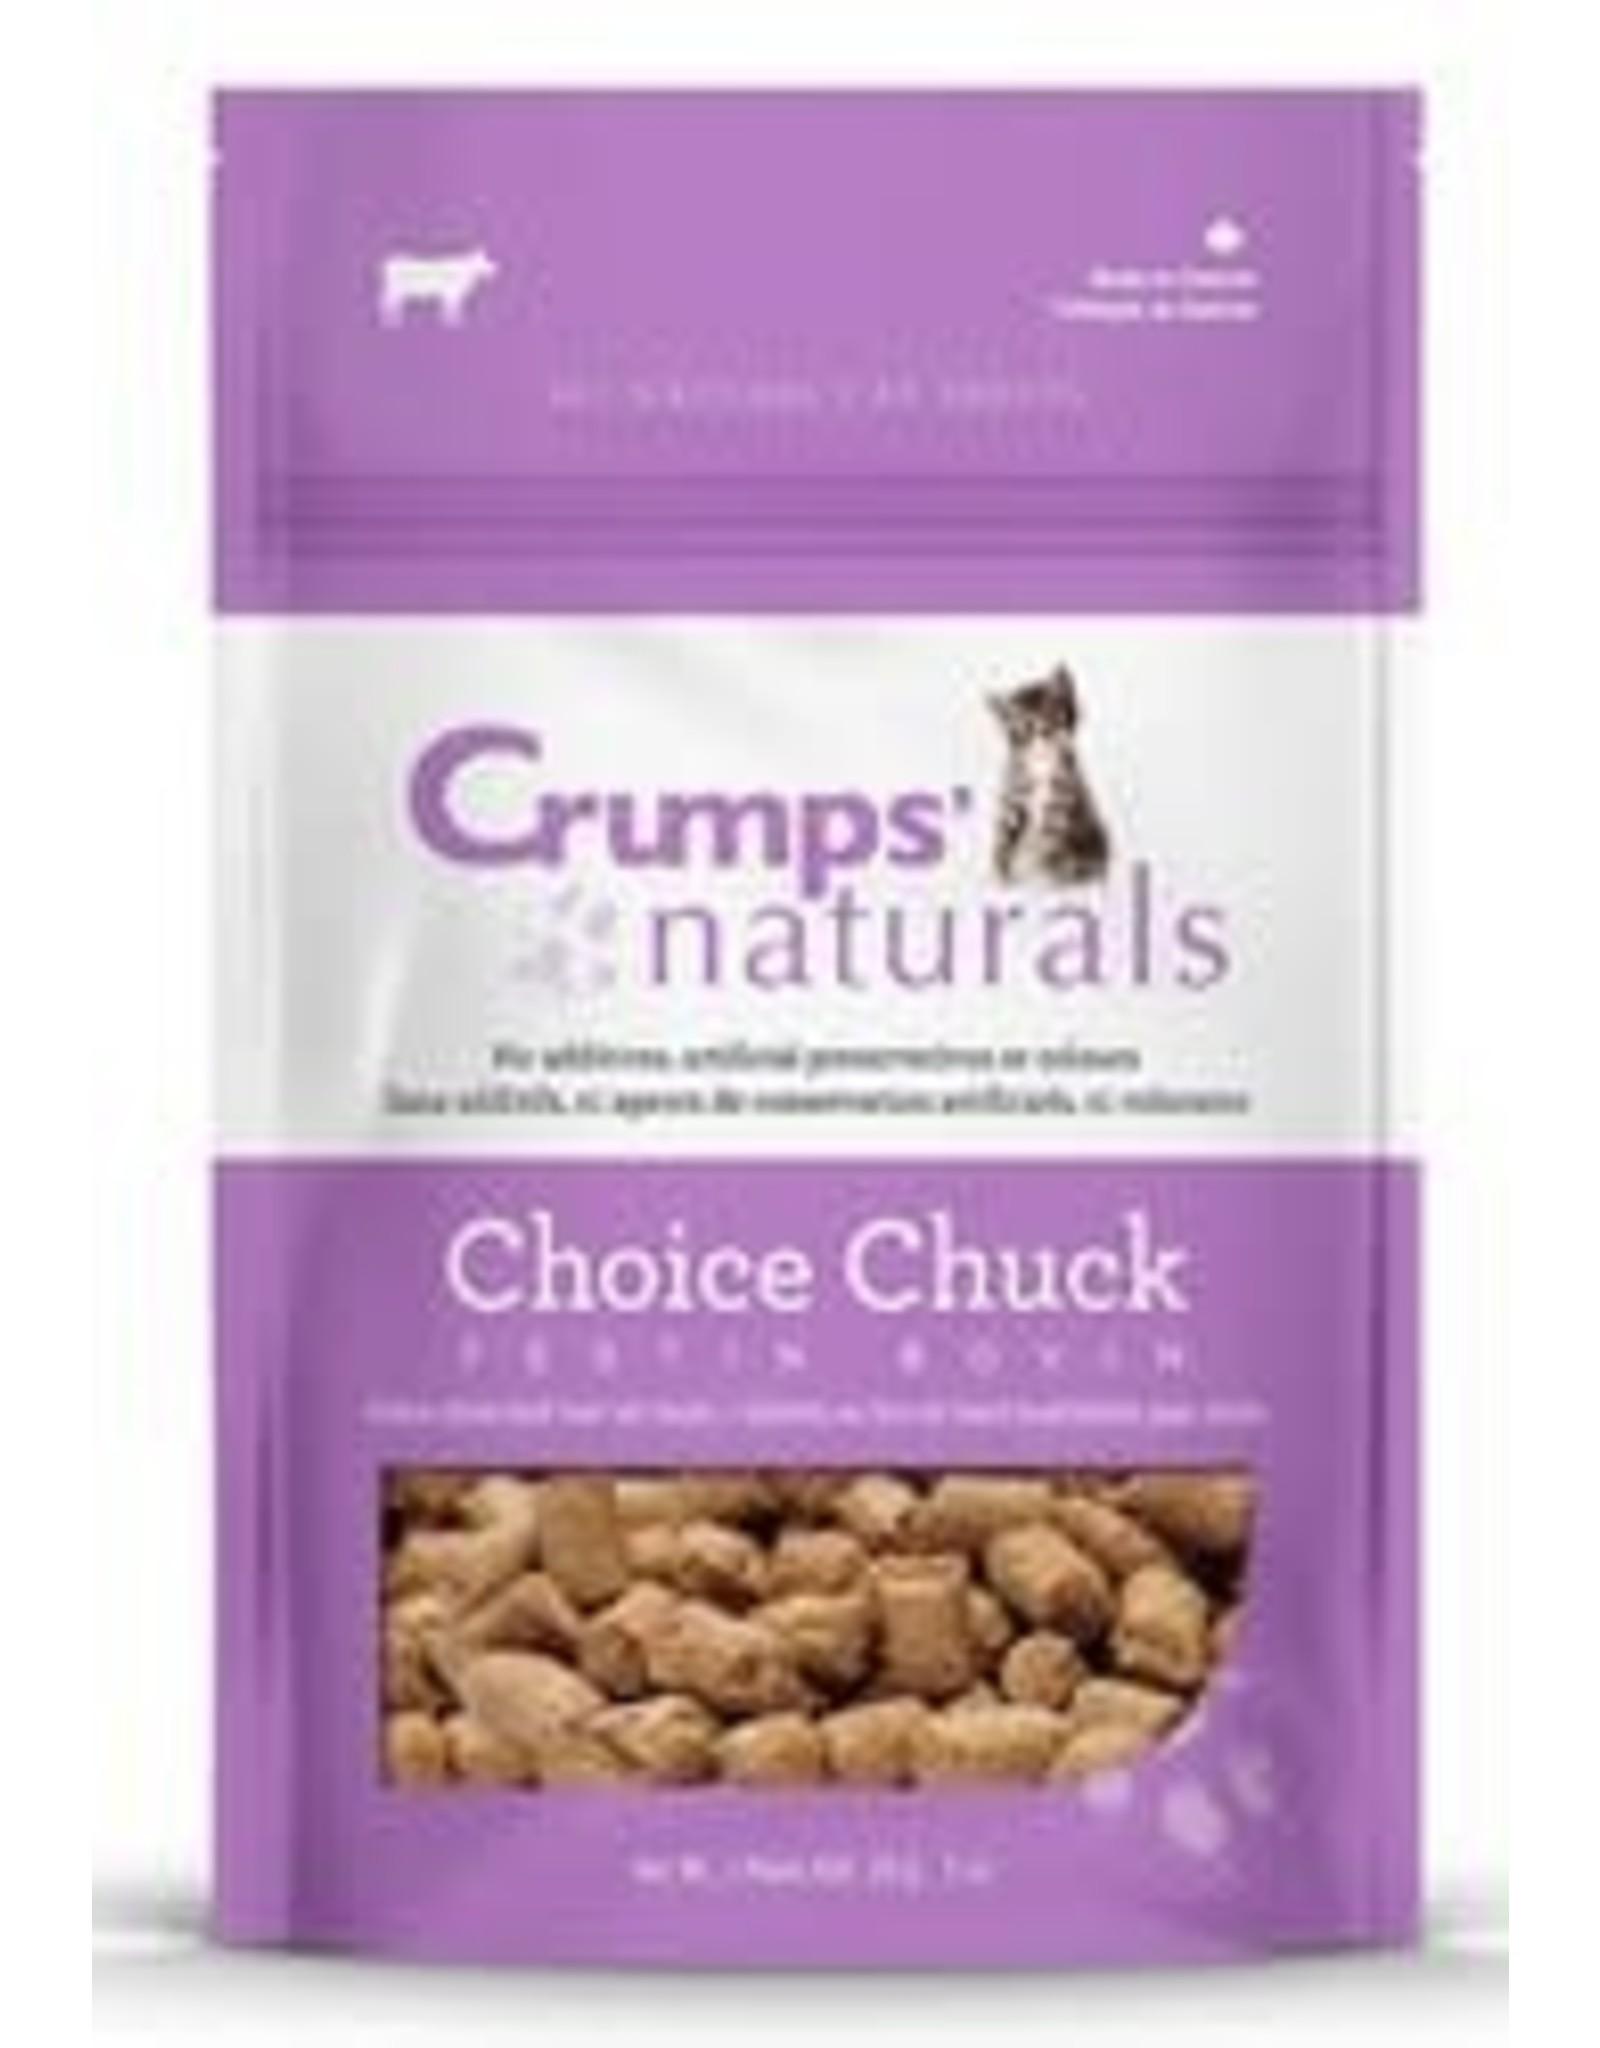 Crumps Crumps' Choice Chuck Beef Cat Treats 28g